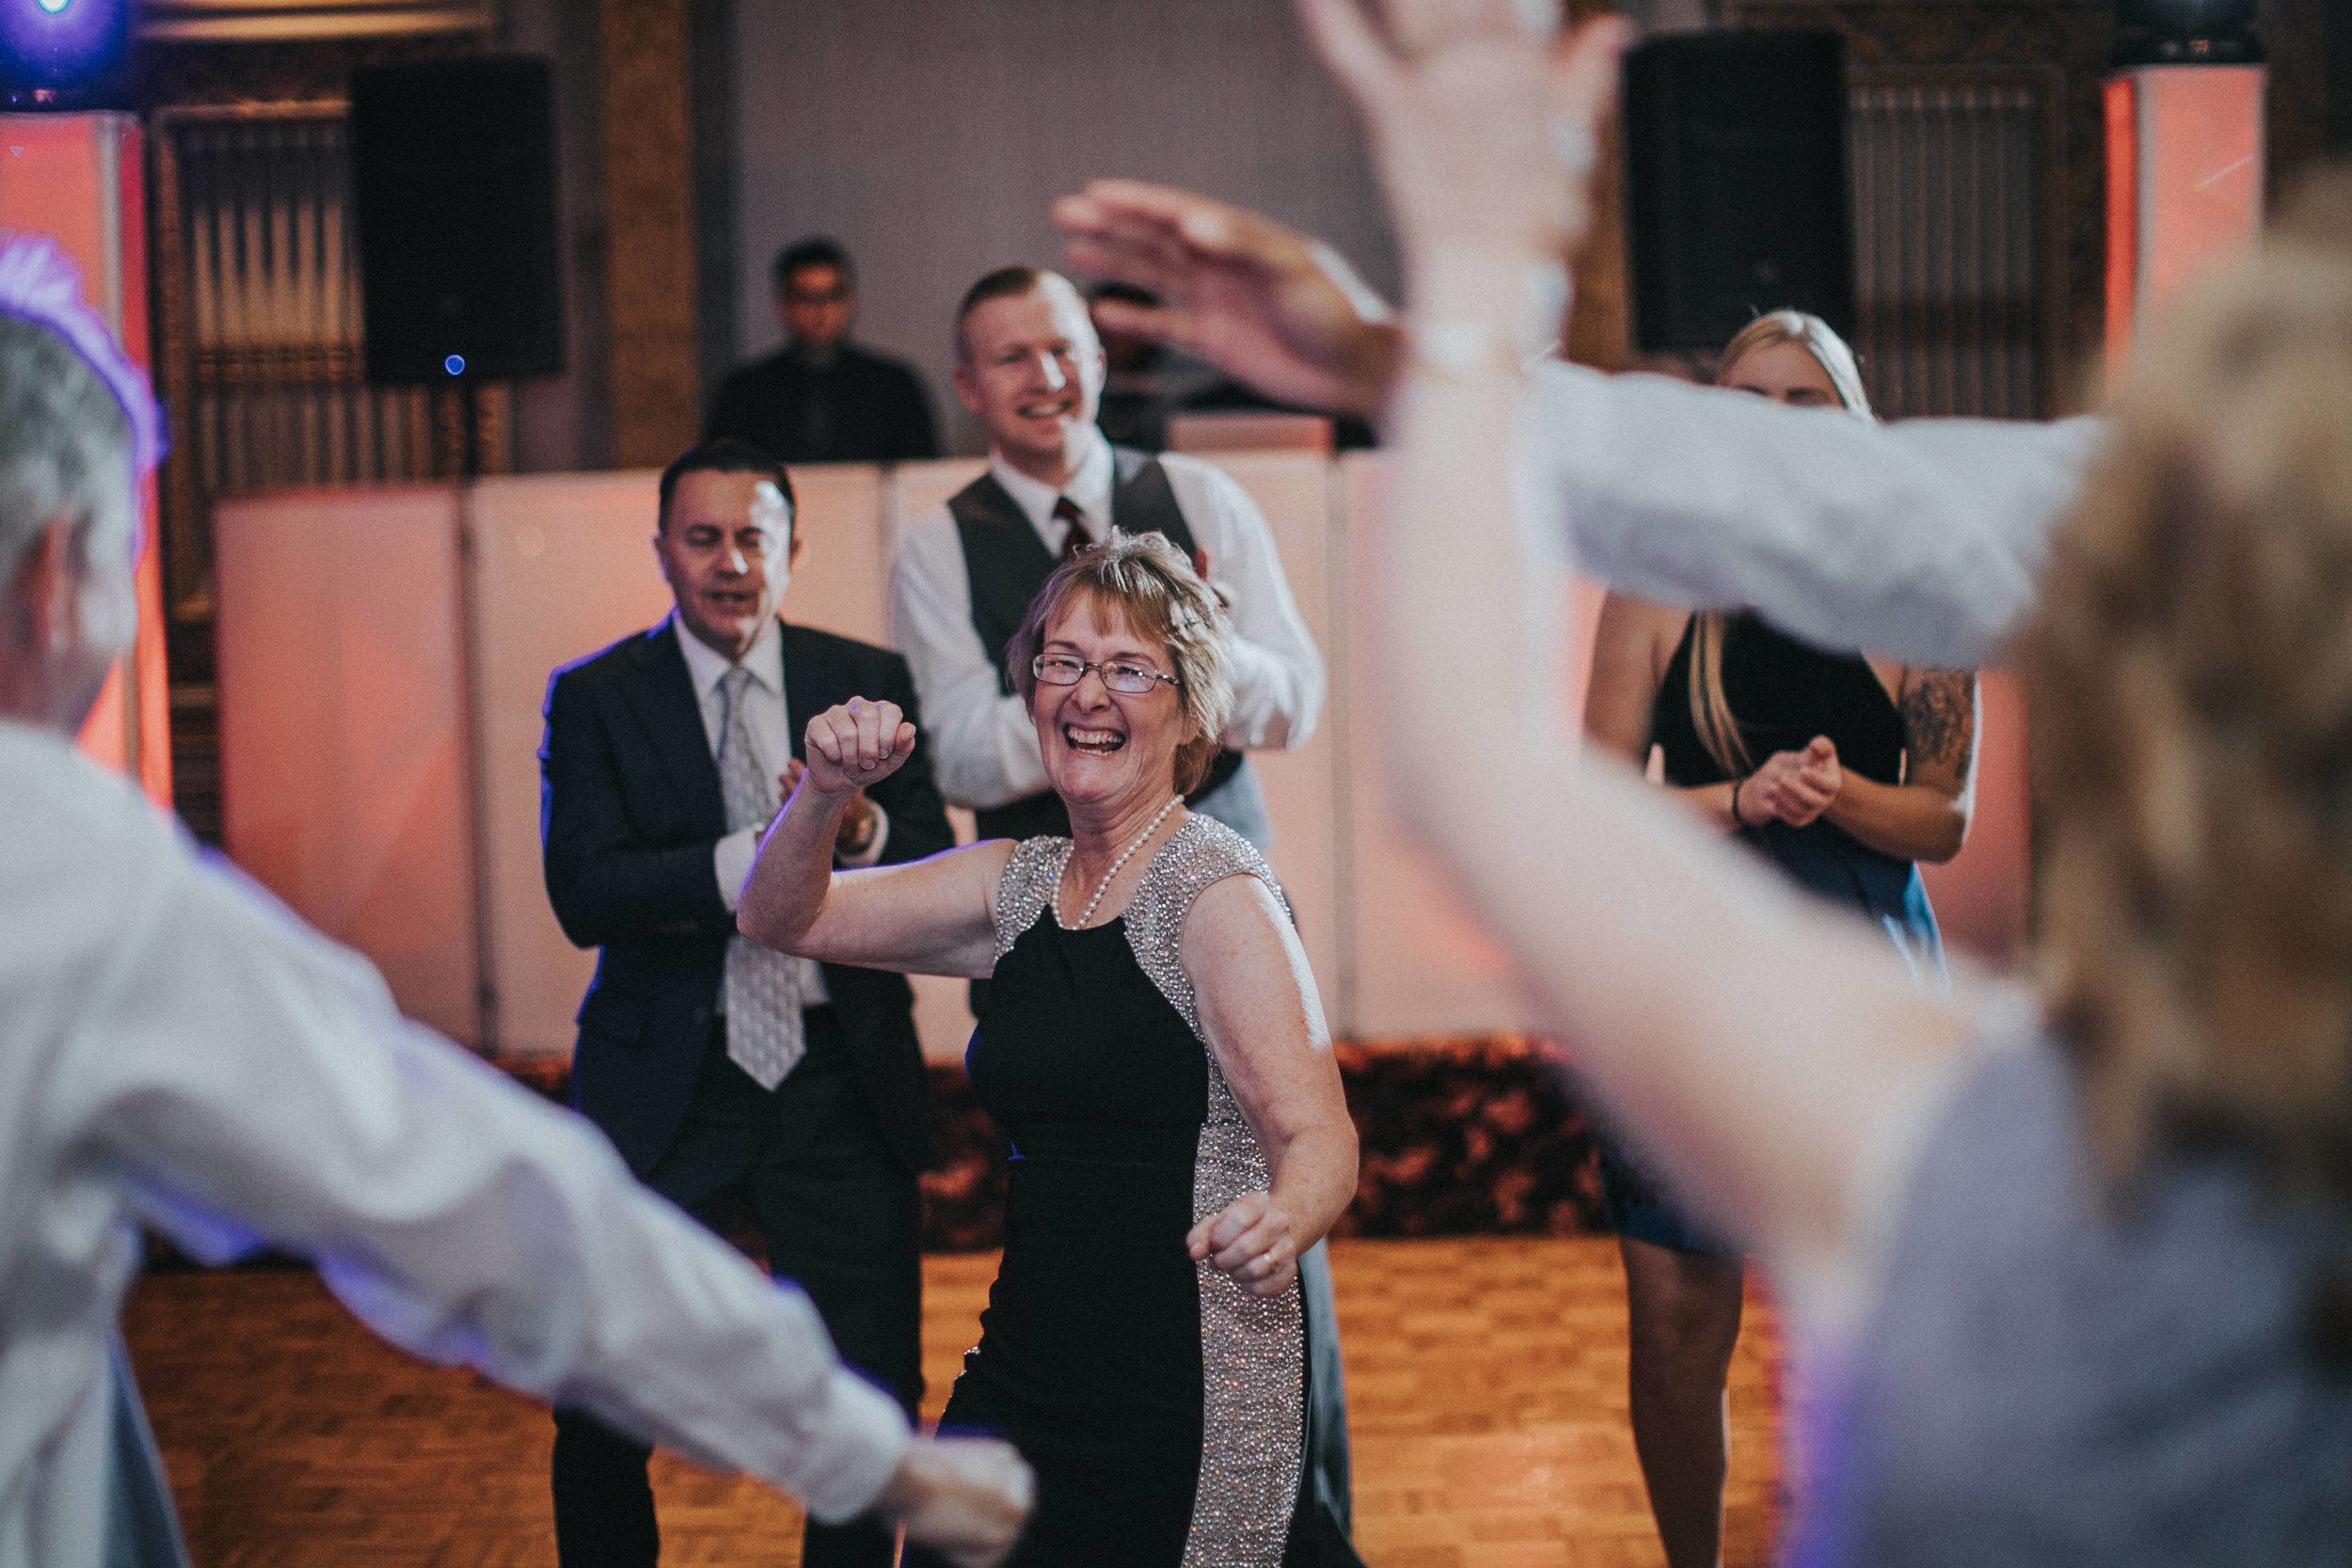 New-Jersey-Wedding-Photography-Fishers-Tudor-House-JennaLynnPhotography-Reception-Kathleen&Eddie-215.jpg